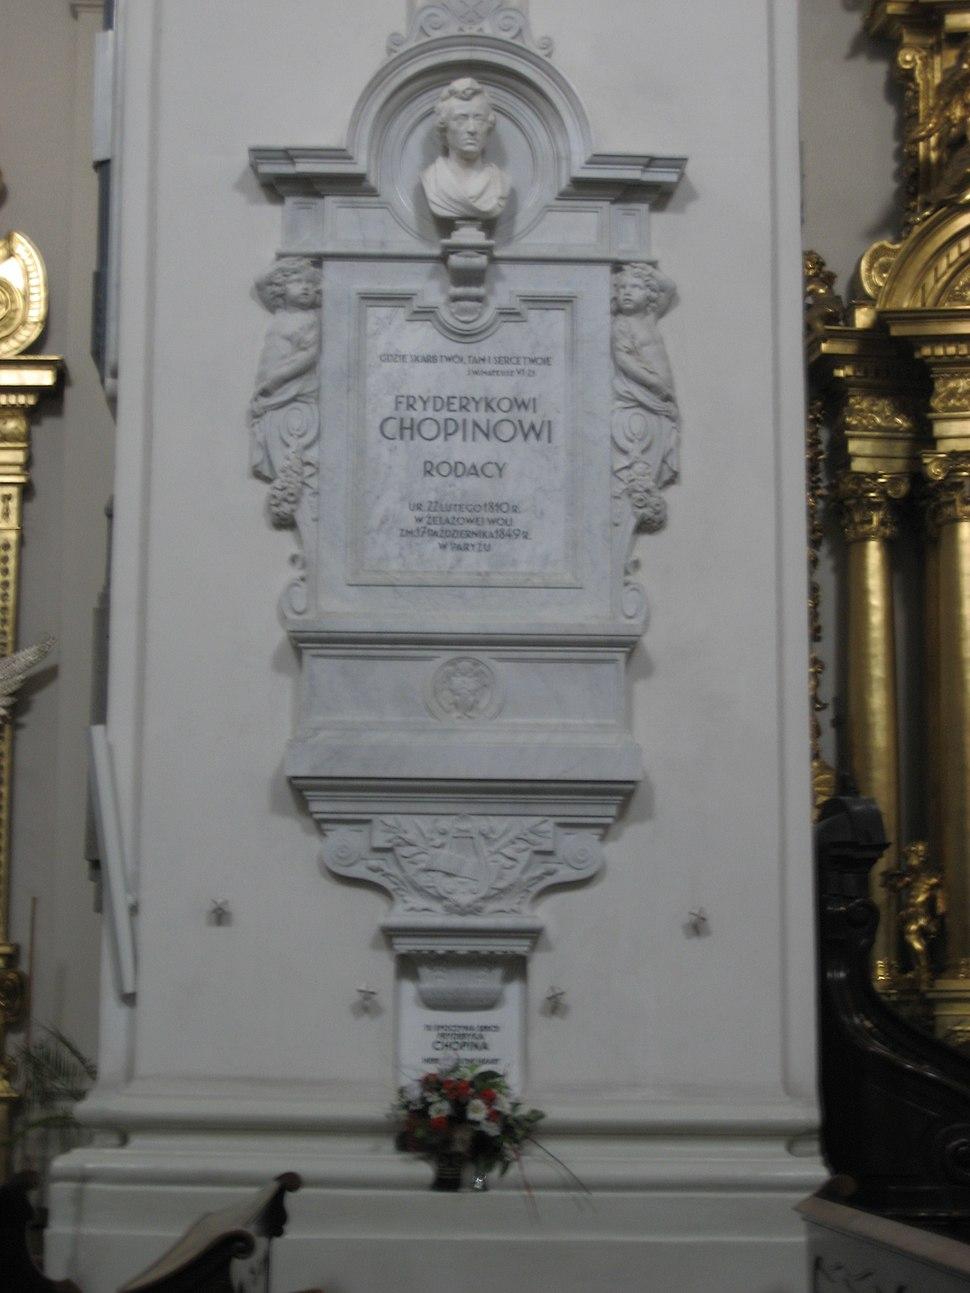 Pillar containing Chopin's heart